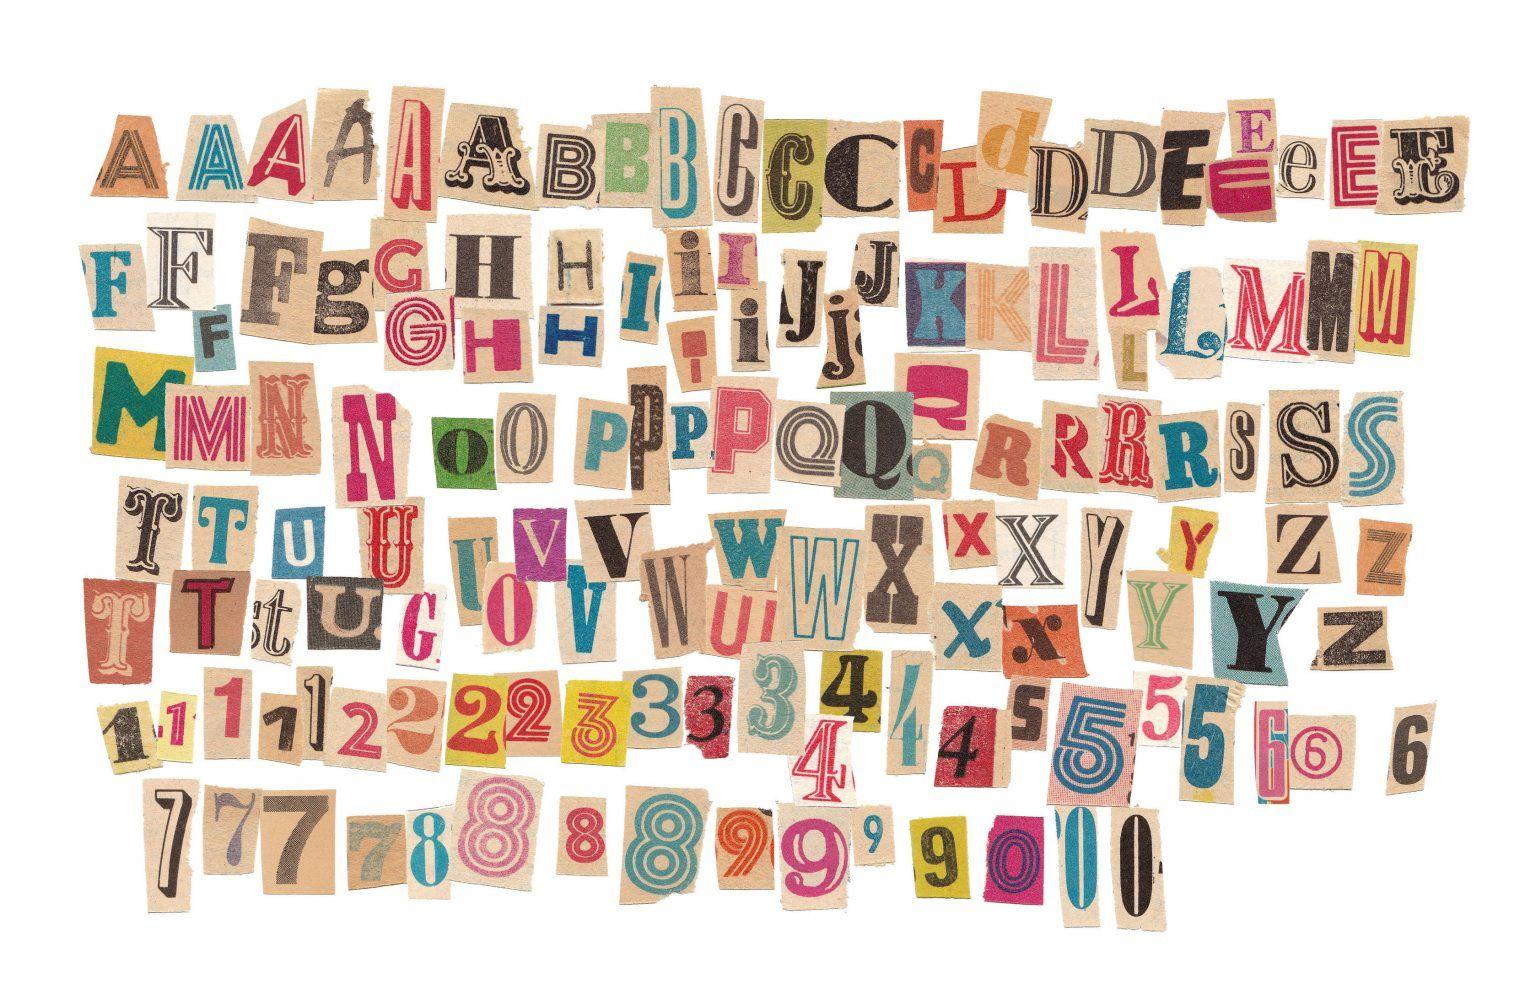 142 Retro Magazine Cutout Letters Png Transparent Onlygfx Com Letter Collage Vintage Lettering Altered Book Art